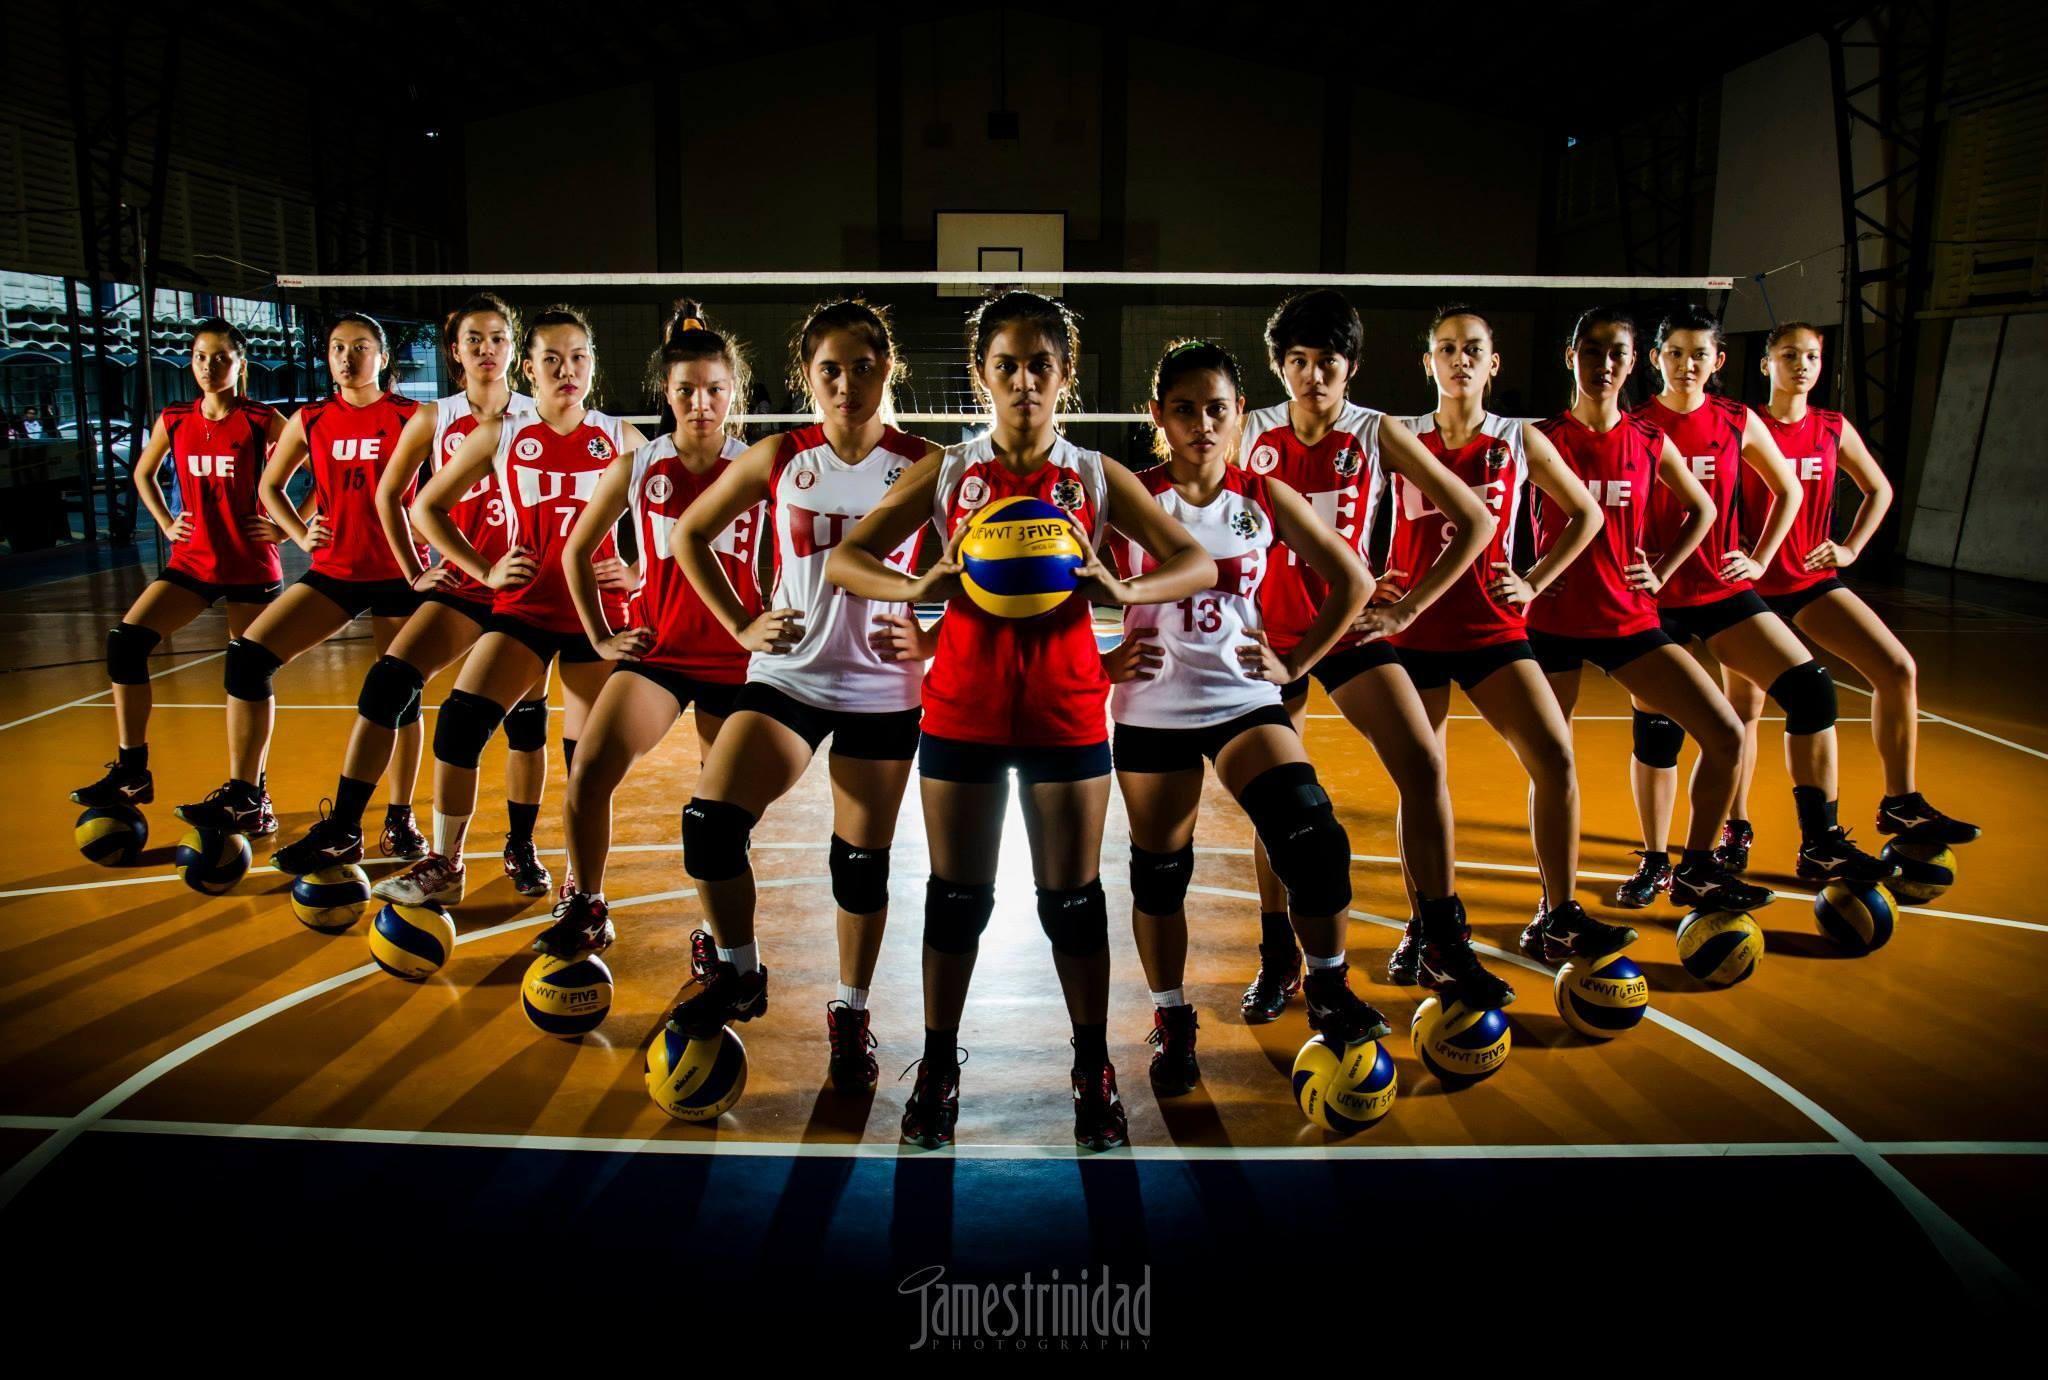 Ue Red Warriors Women S Volleyball Team Women Volleyball Volleyball Team Warrior Woman